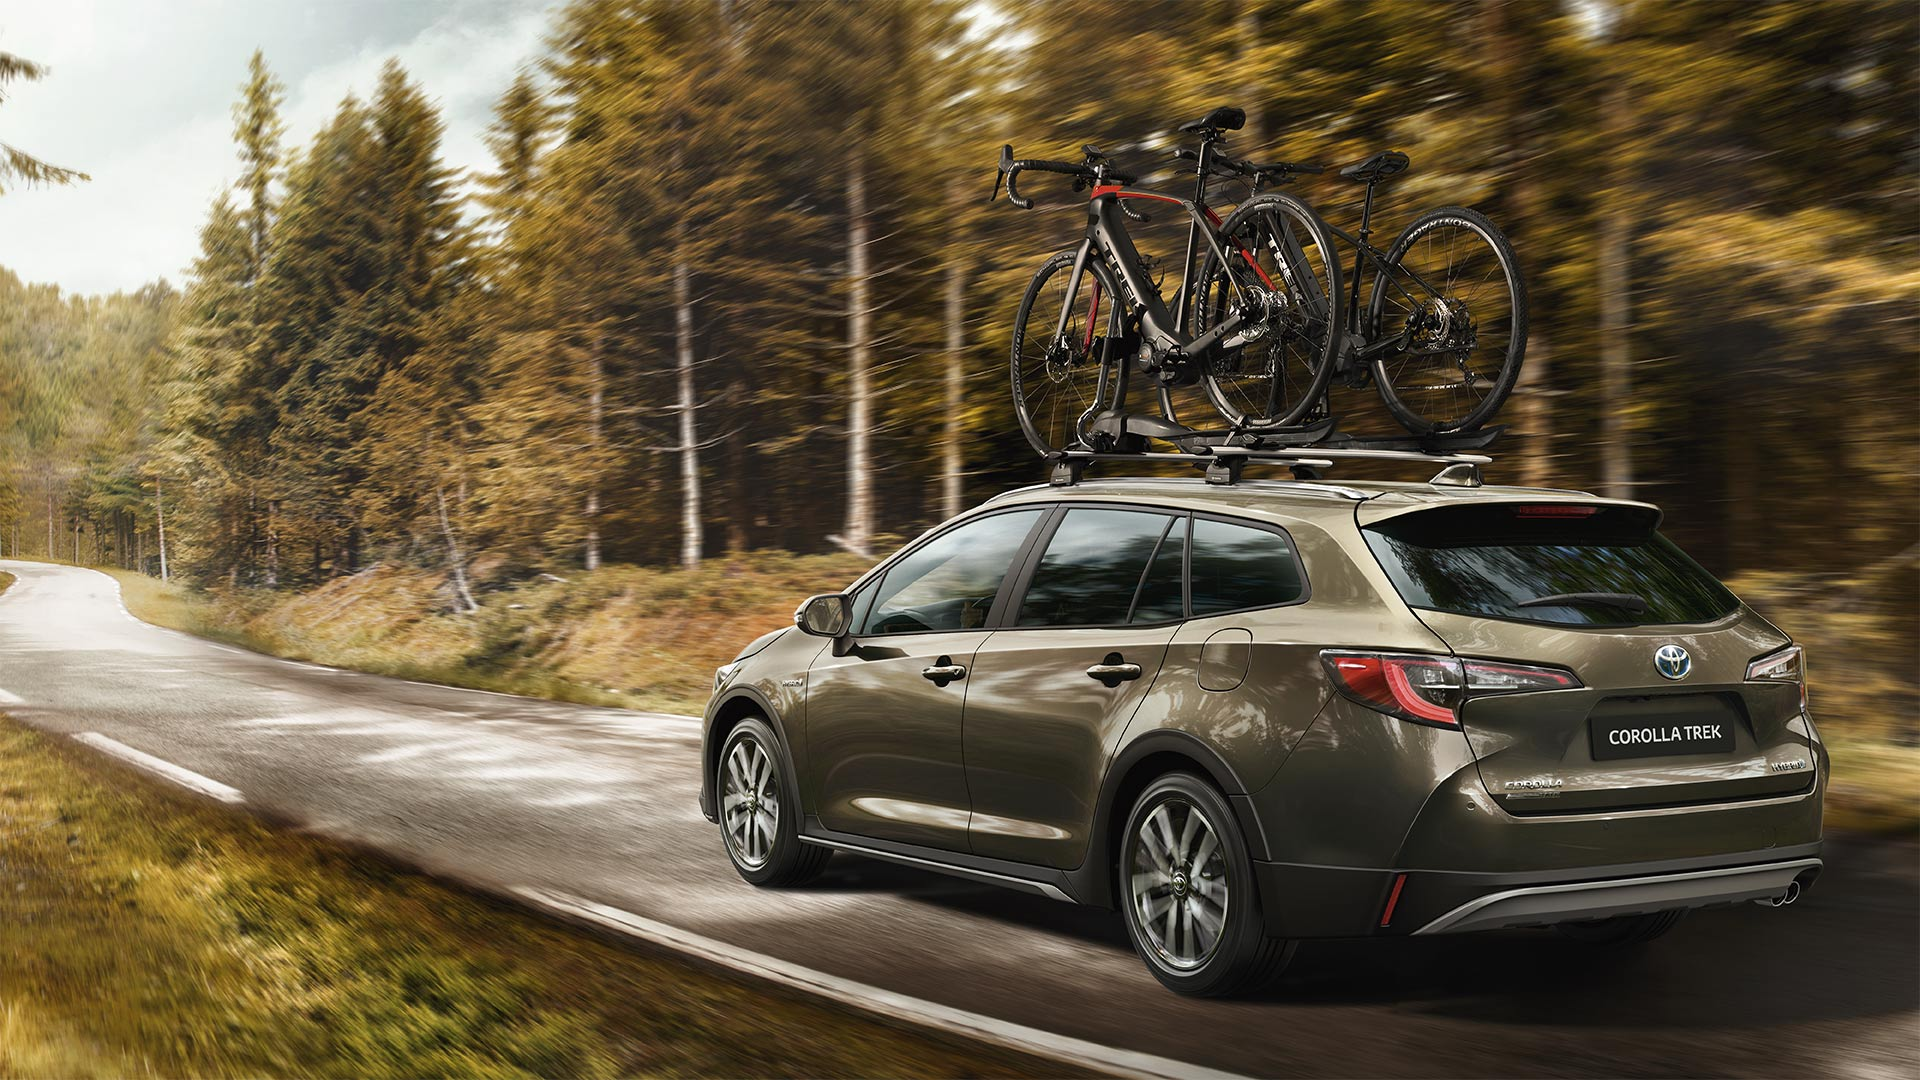 Carro Toyota Corolla Touring Sports viajar em família